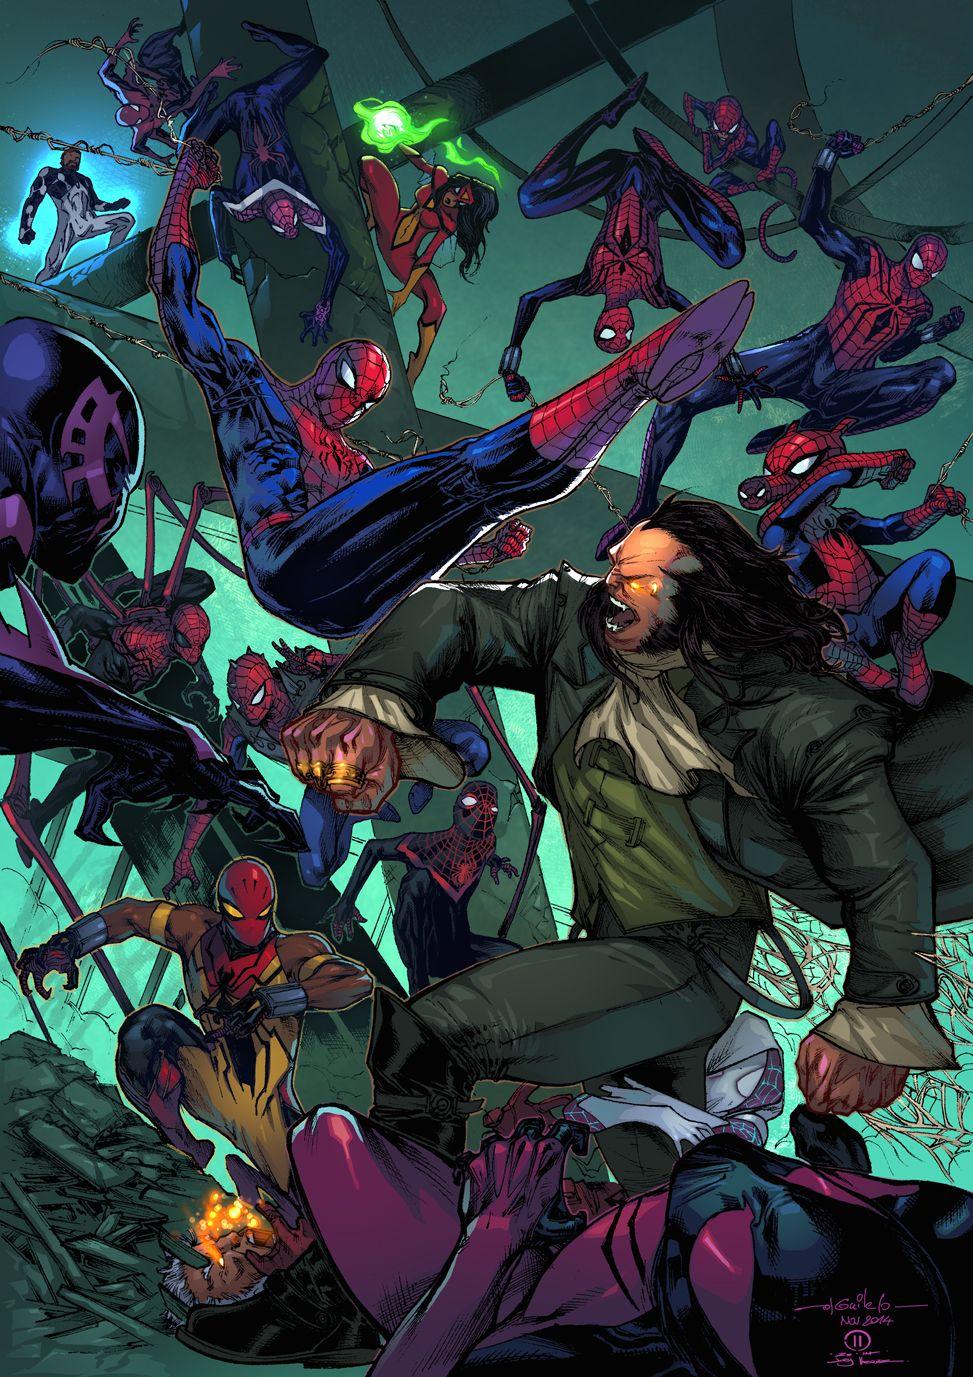 Spider-Man Thursday 40 Joey Vazquez colors by SpiderGuile, Colors by Joey Vazquez